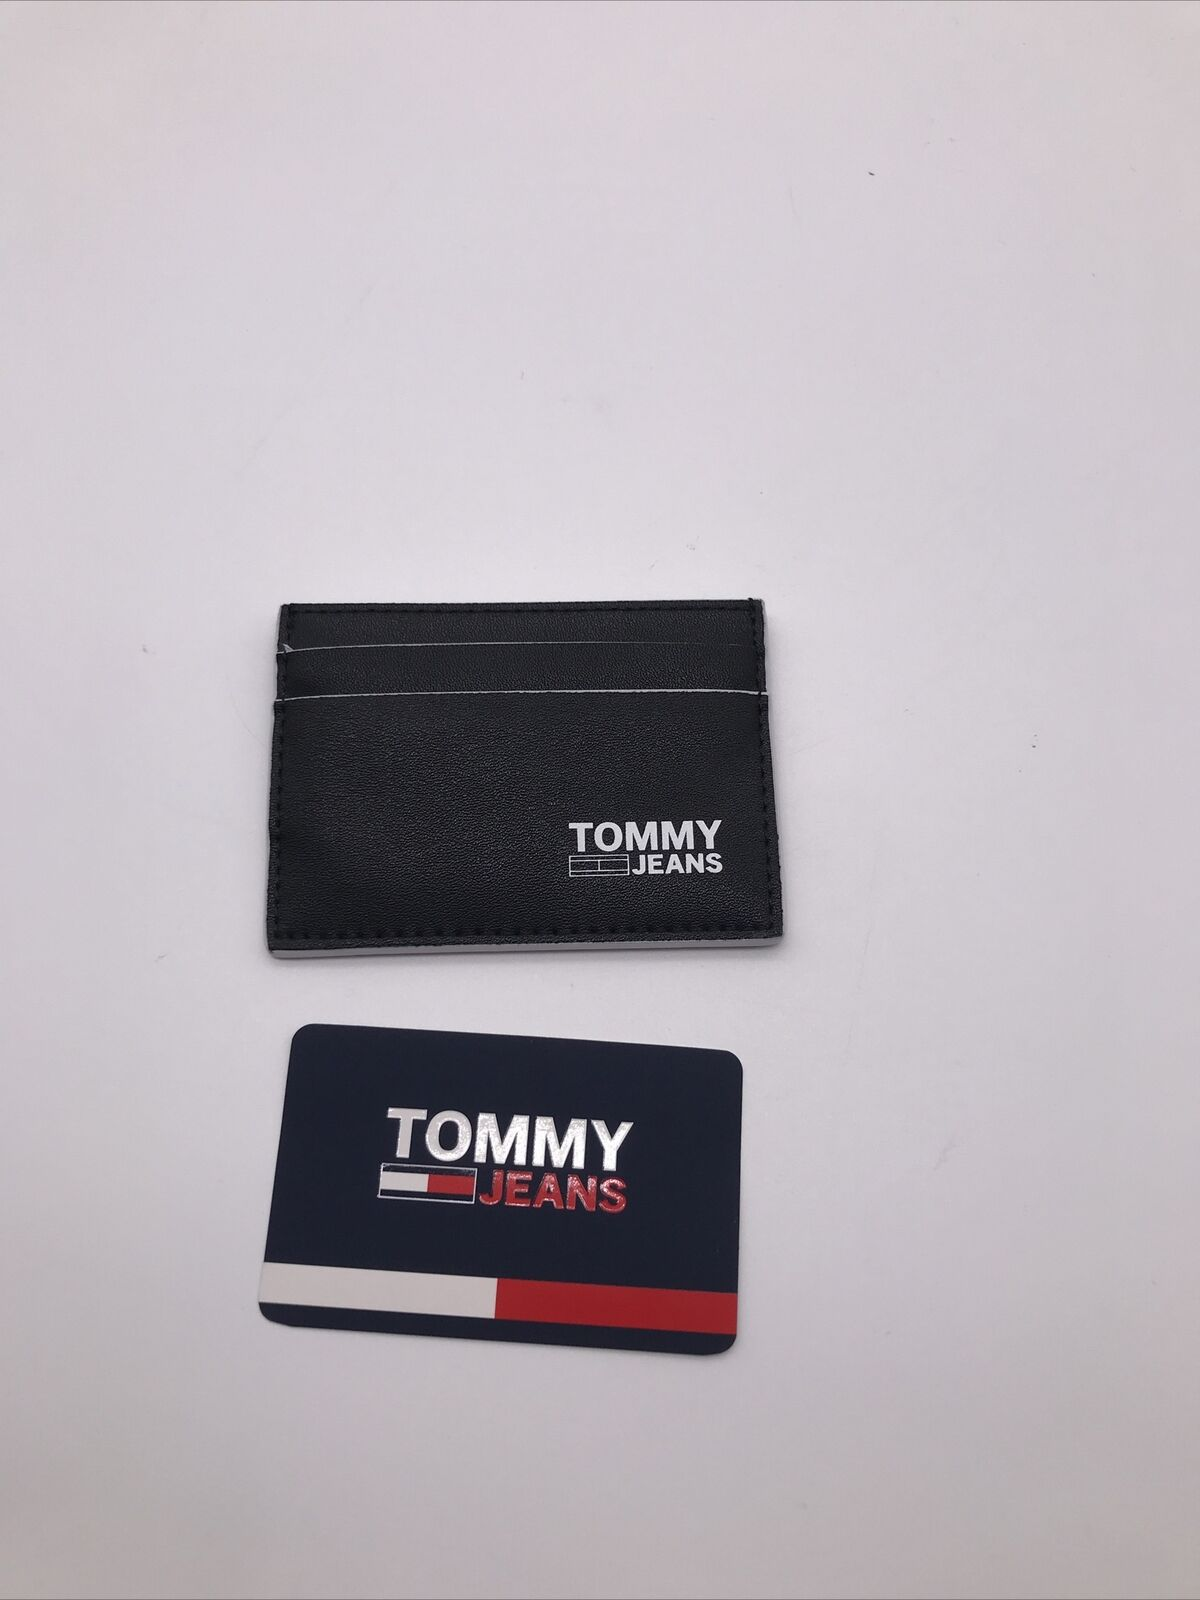 Tommy Hilfiger Jeans Mens Black Logo Recycled Leather Card Holder CC Holder New